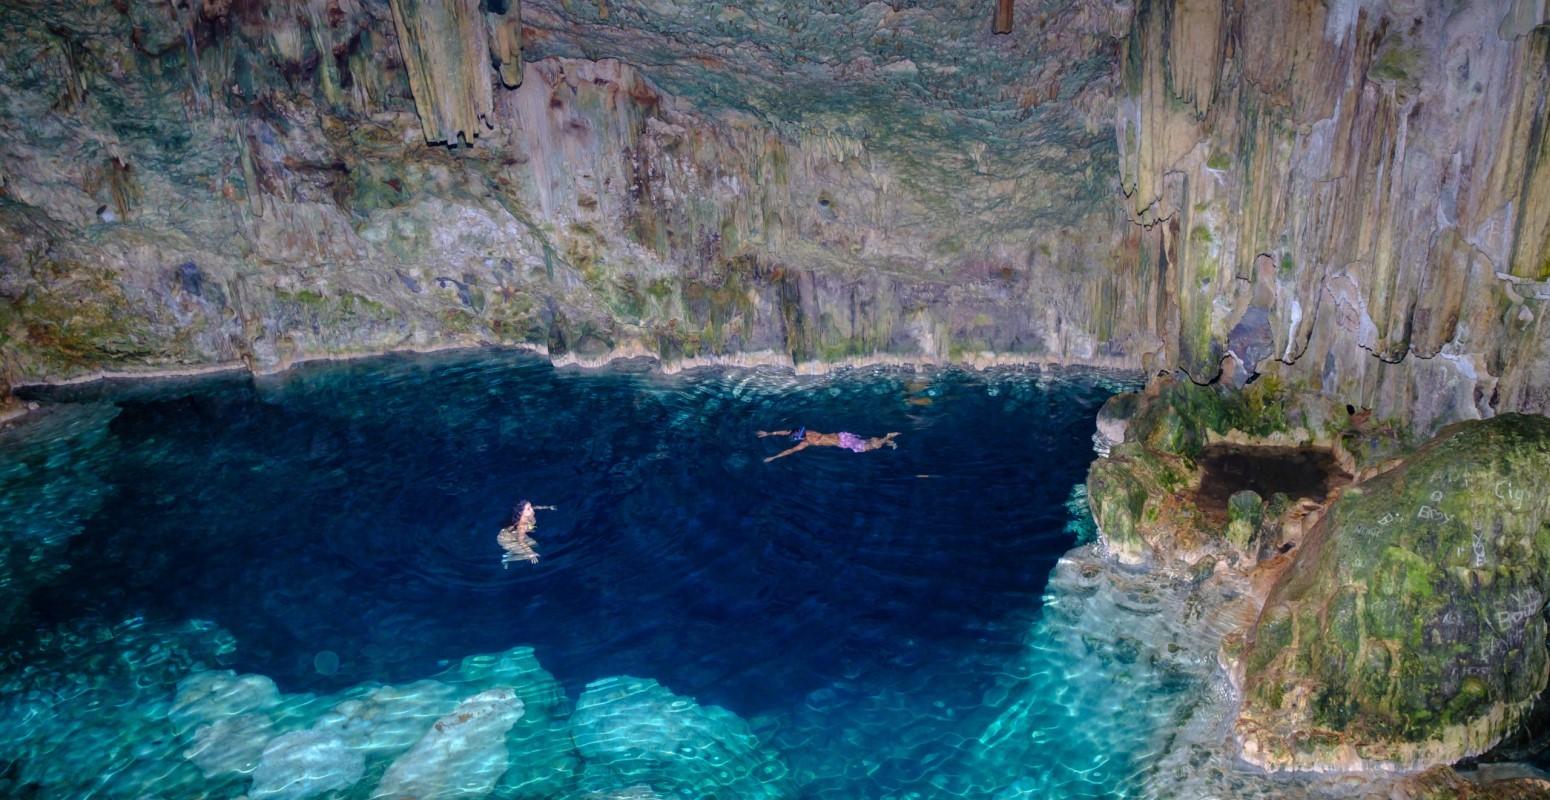 cueva saturno varadero cuba monoparental